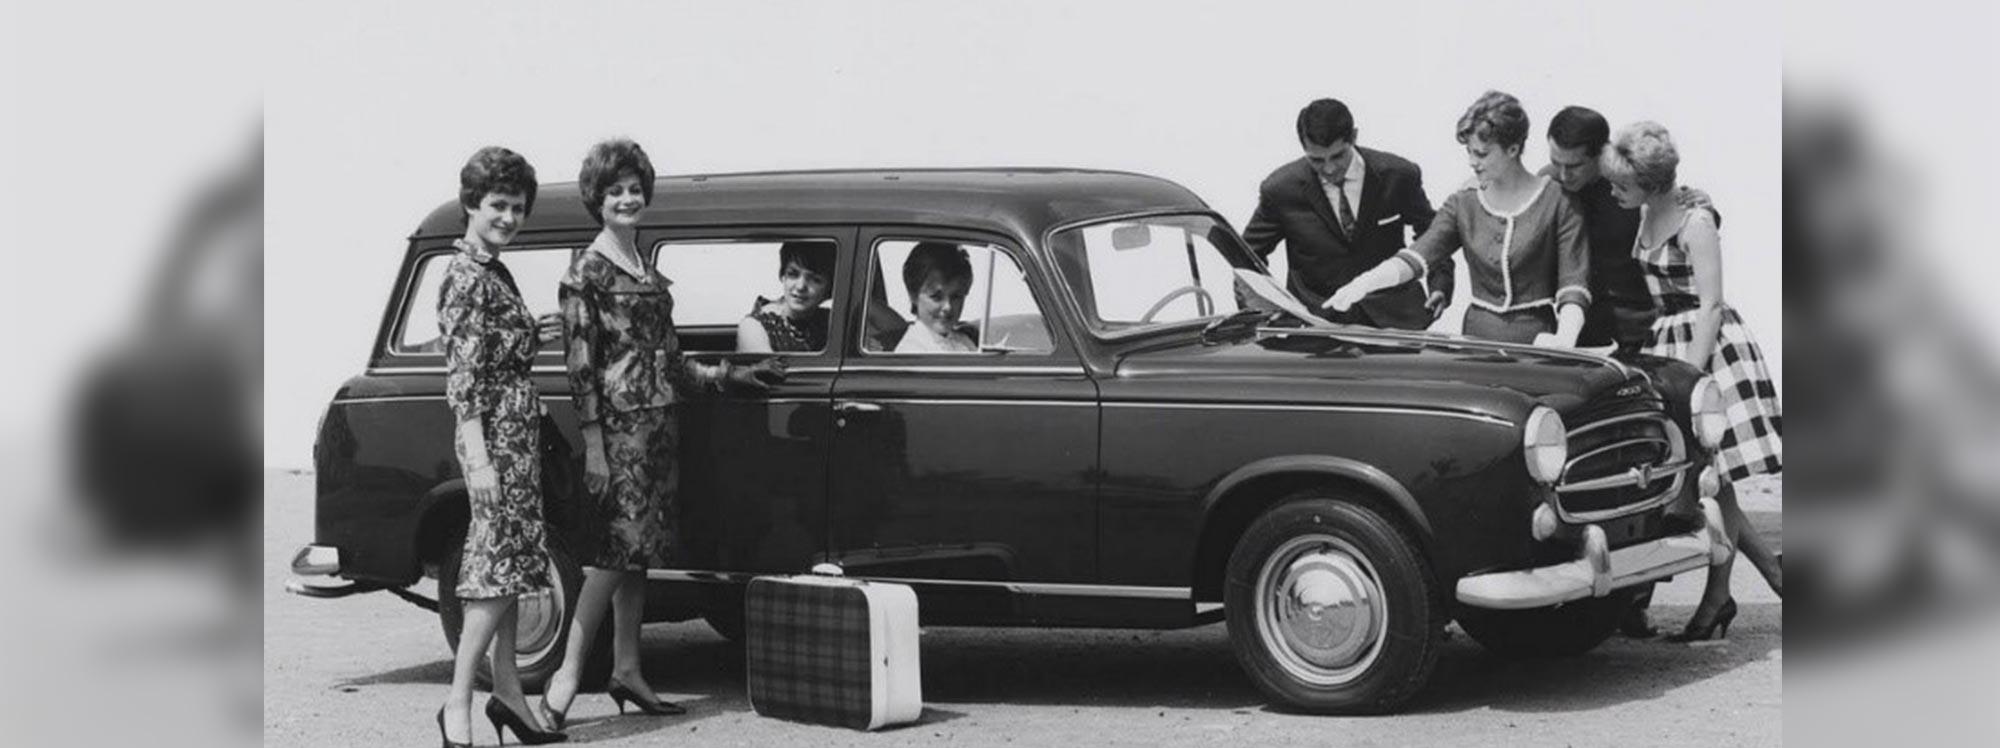 Los coches familiares de Peugeot